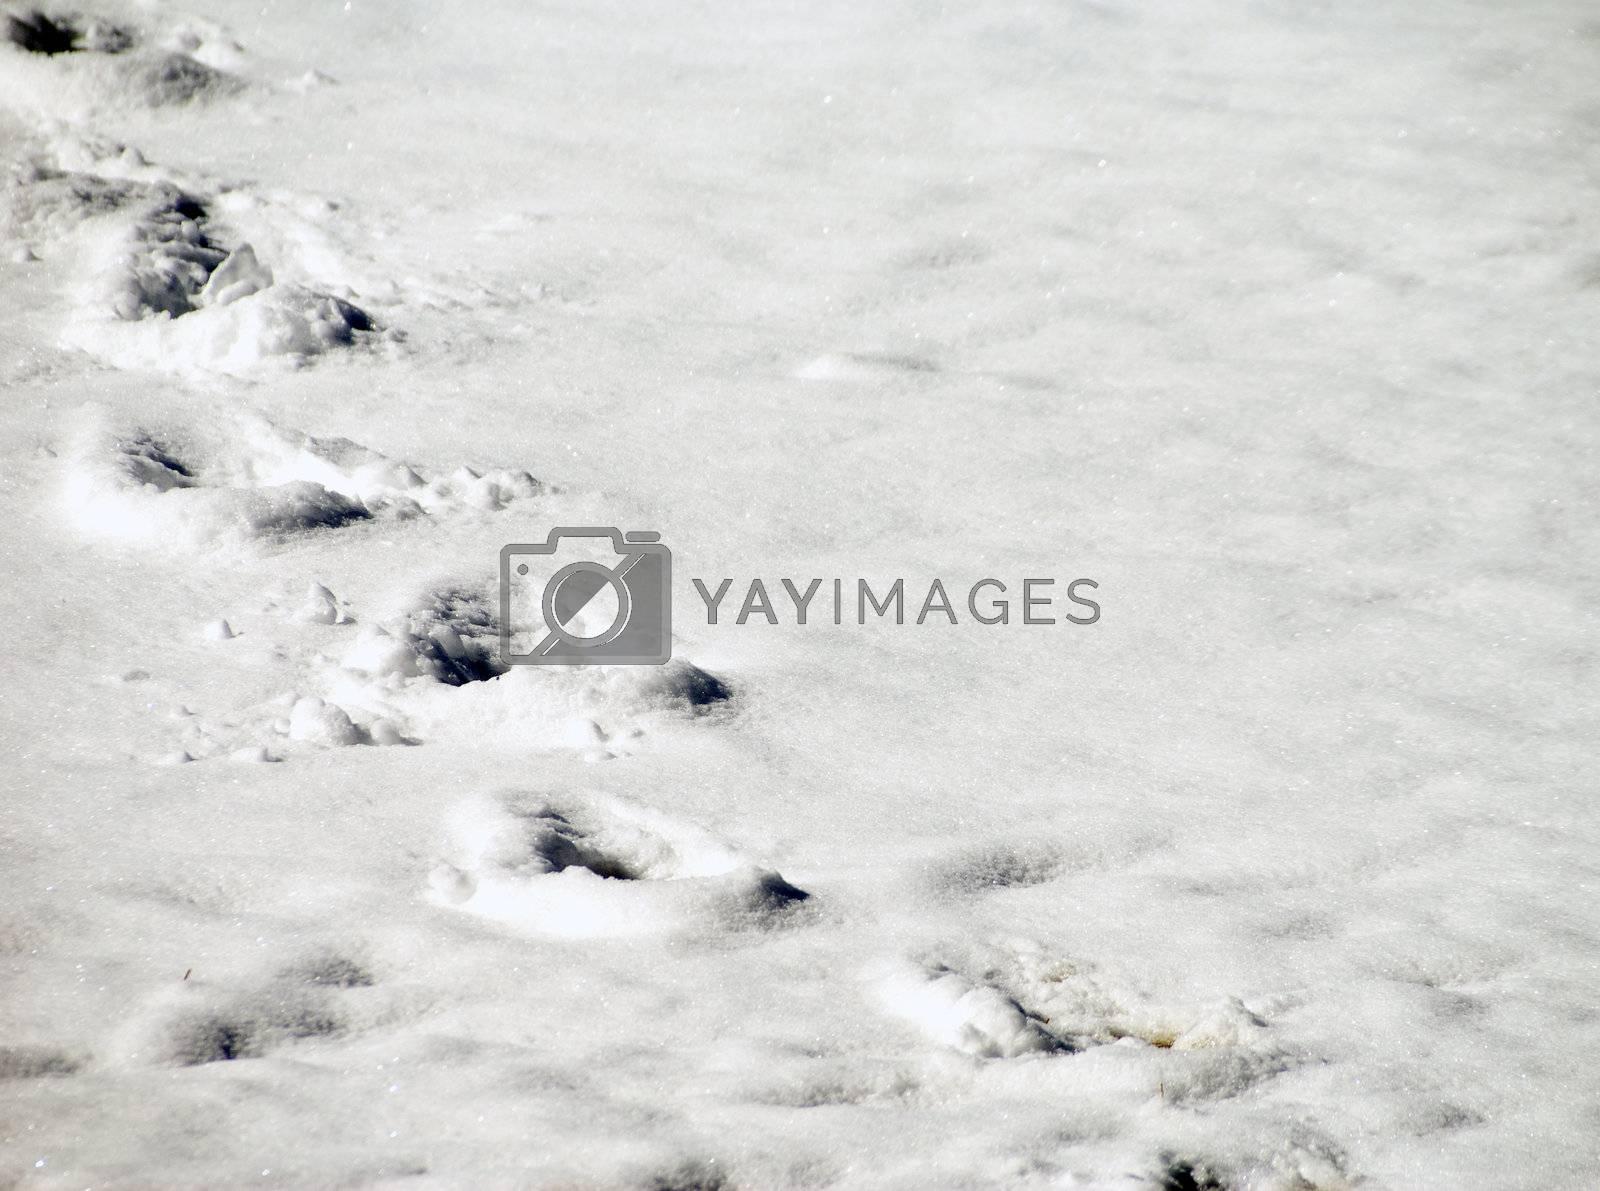 A set of deep footprints in freshly fallen snow.